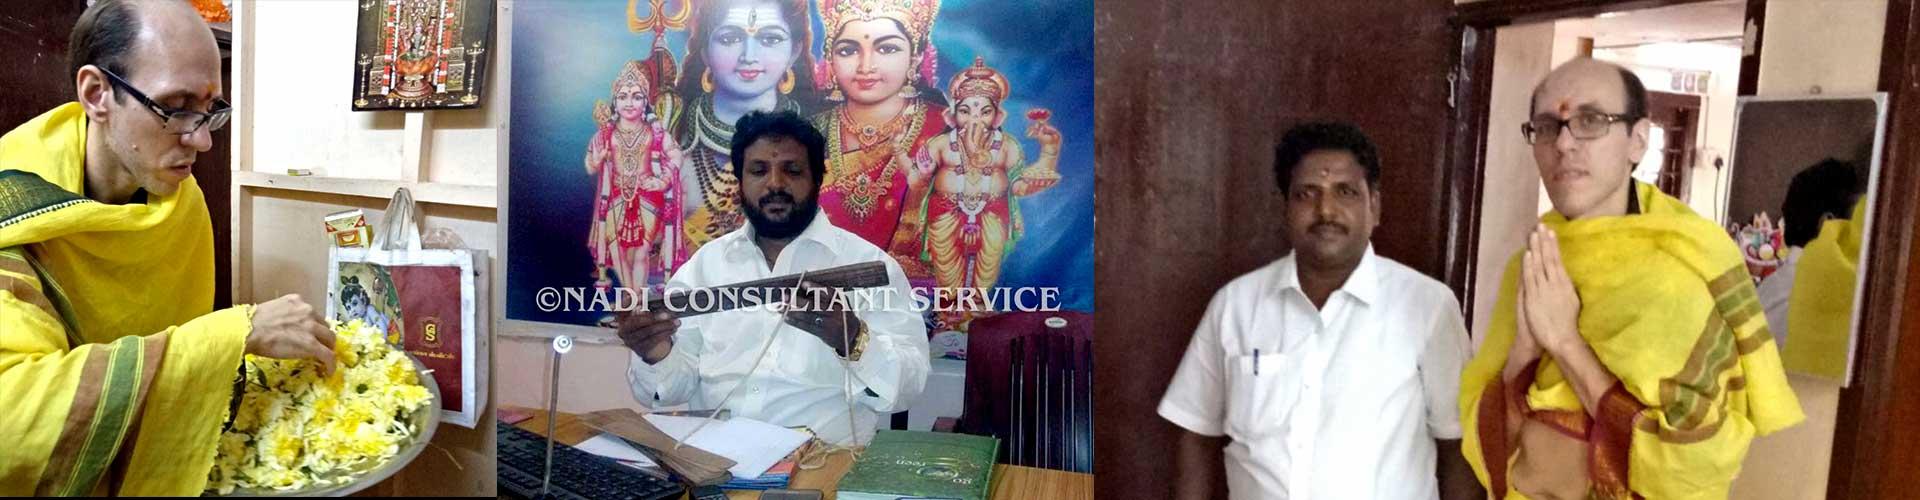 Nadi Astrology Trivandrum | Nadi Astrology Kerala, thiruvananthapuram